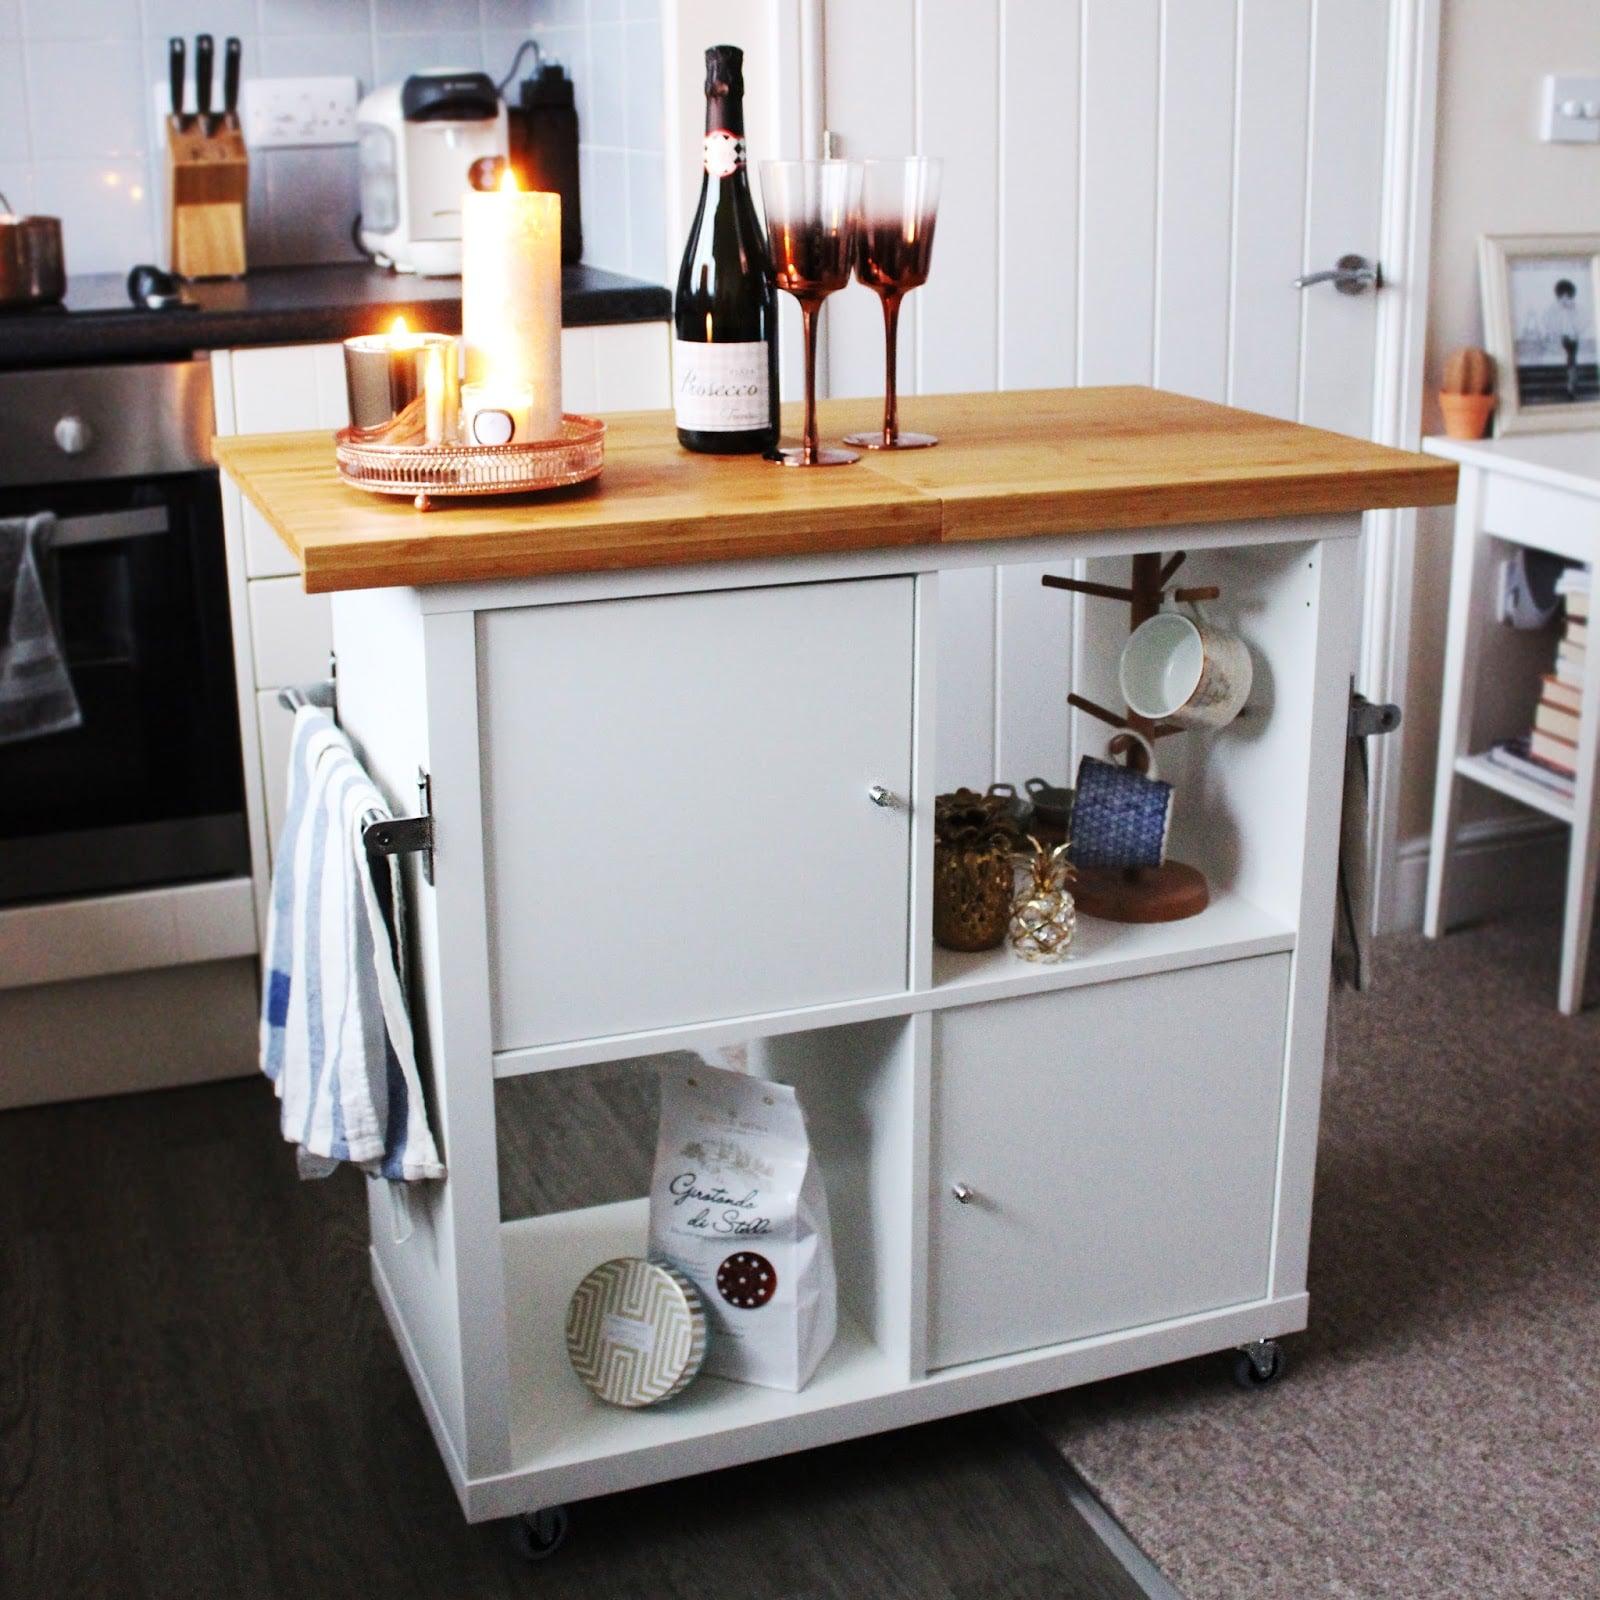 Wheeled Kitchen Island | 9 Ikea Kitchen Hacks That Change ...